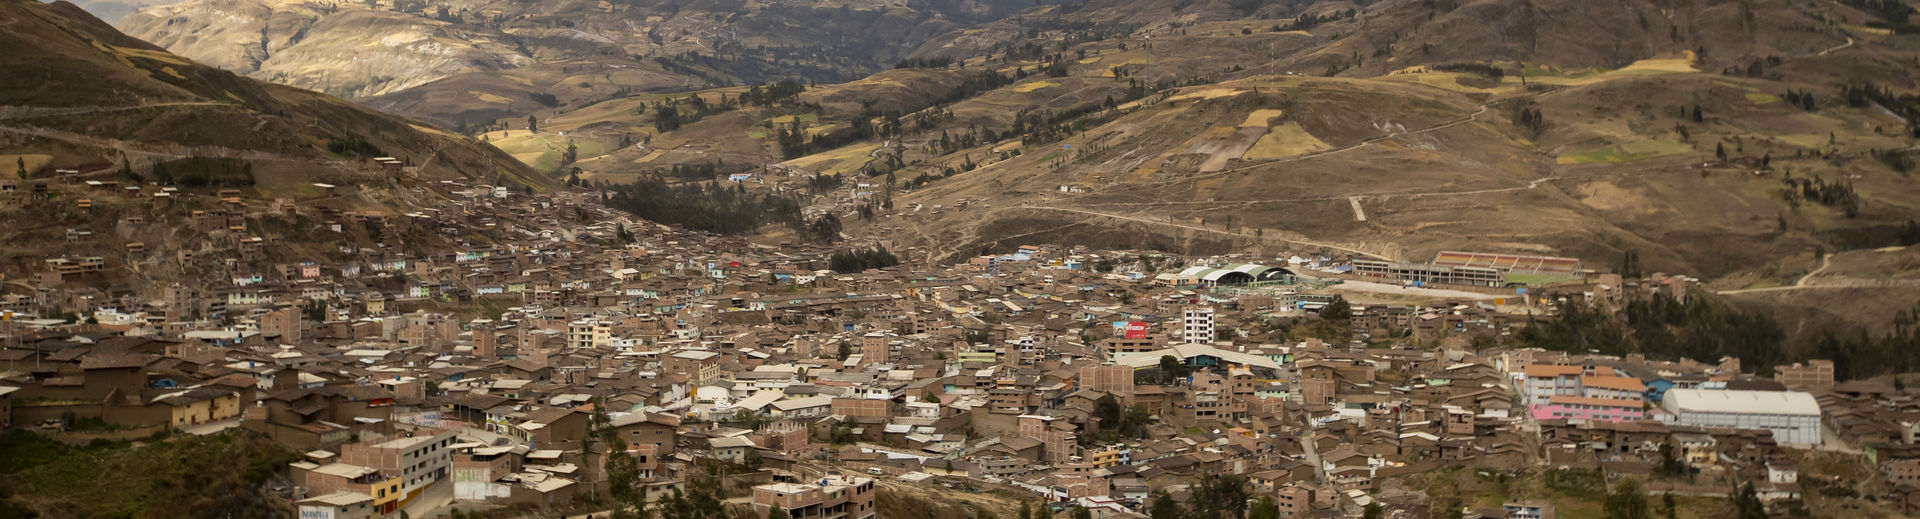 The landscape of a Peruvian city.